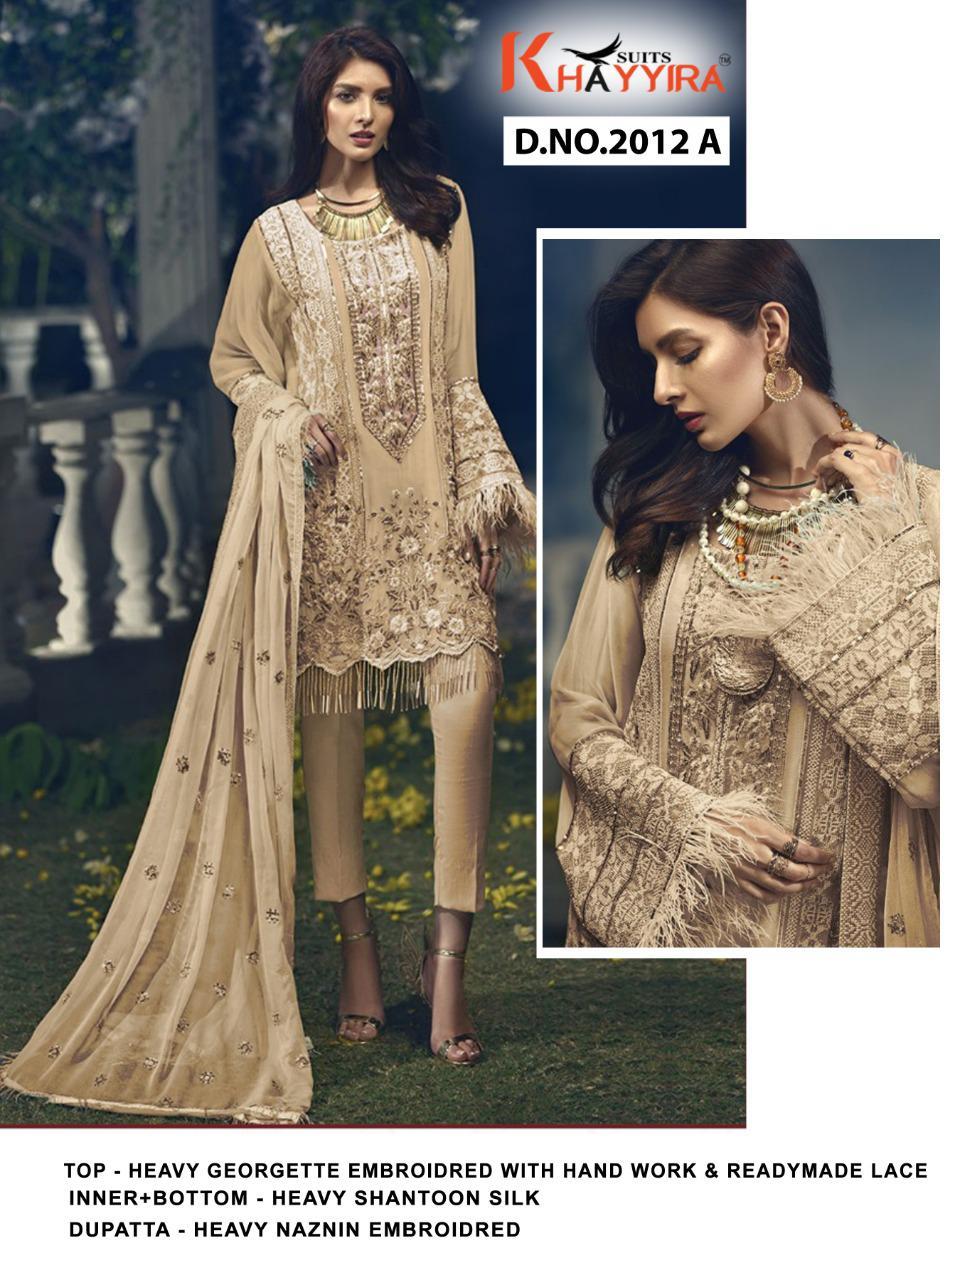 Khayyira Cross Stitch Salwar Suit Wholesale Catalog 8 Pcs 8 - Khayyira Cross Stitch Salwar Suit Wholesale Catalog 8 Pcs